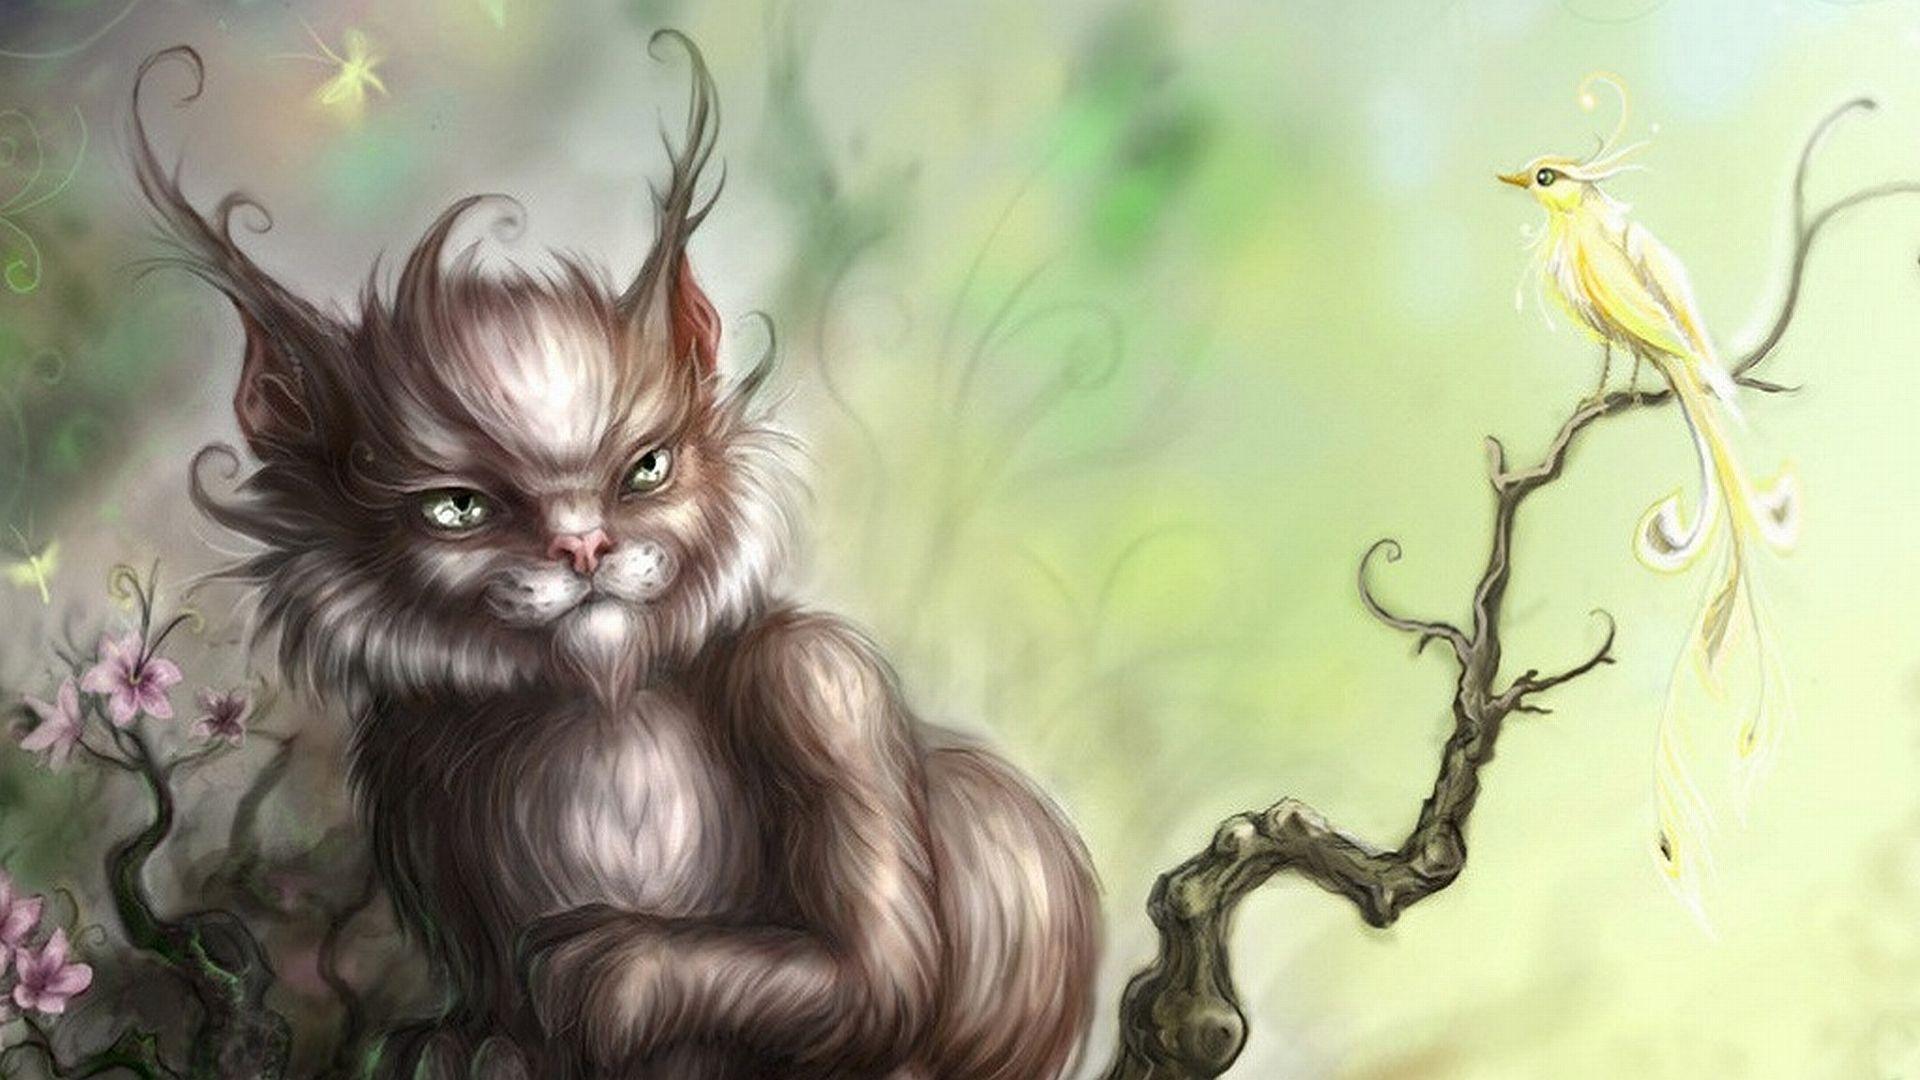 Magical Cat Game Free Download